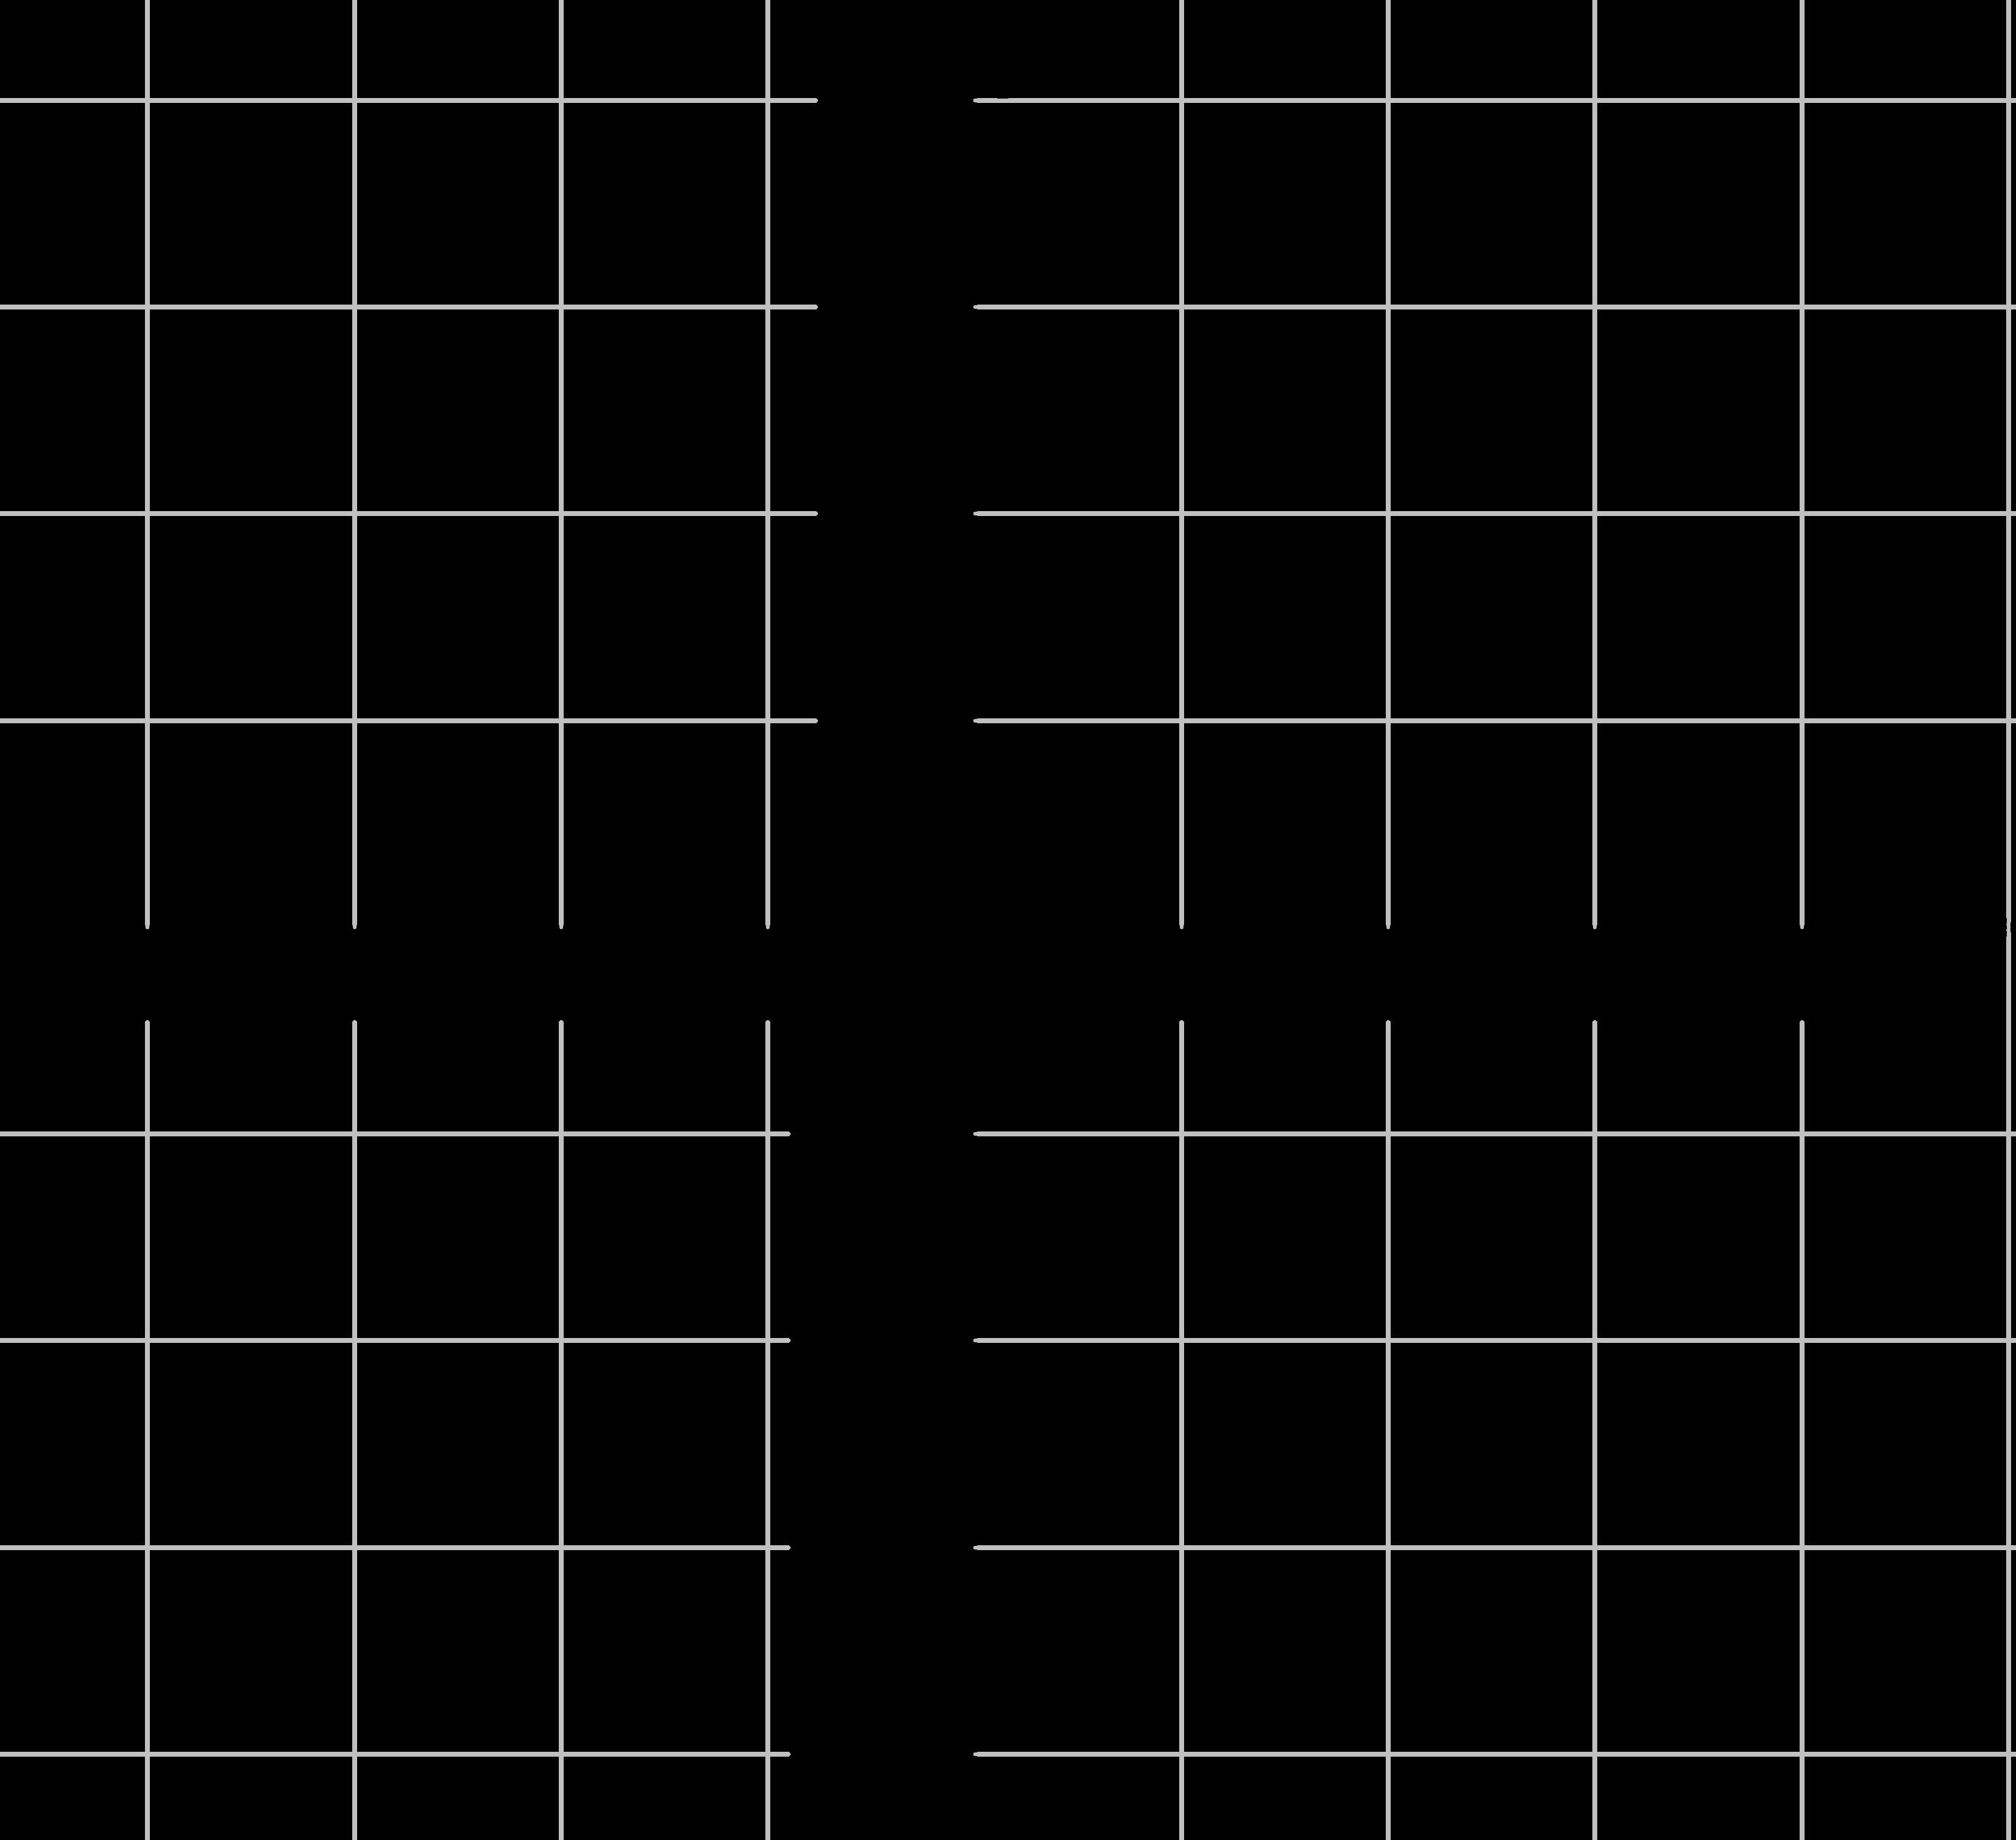 Einheitskreis Koordinatensystem